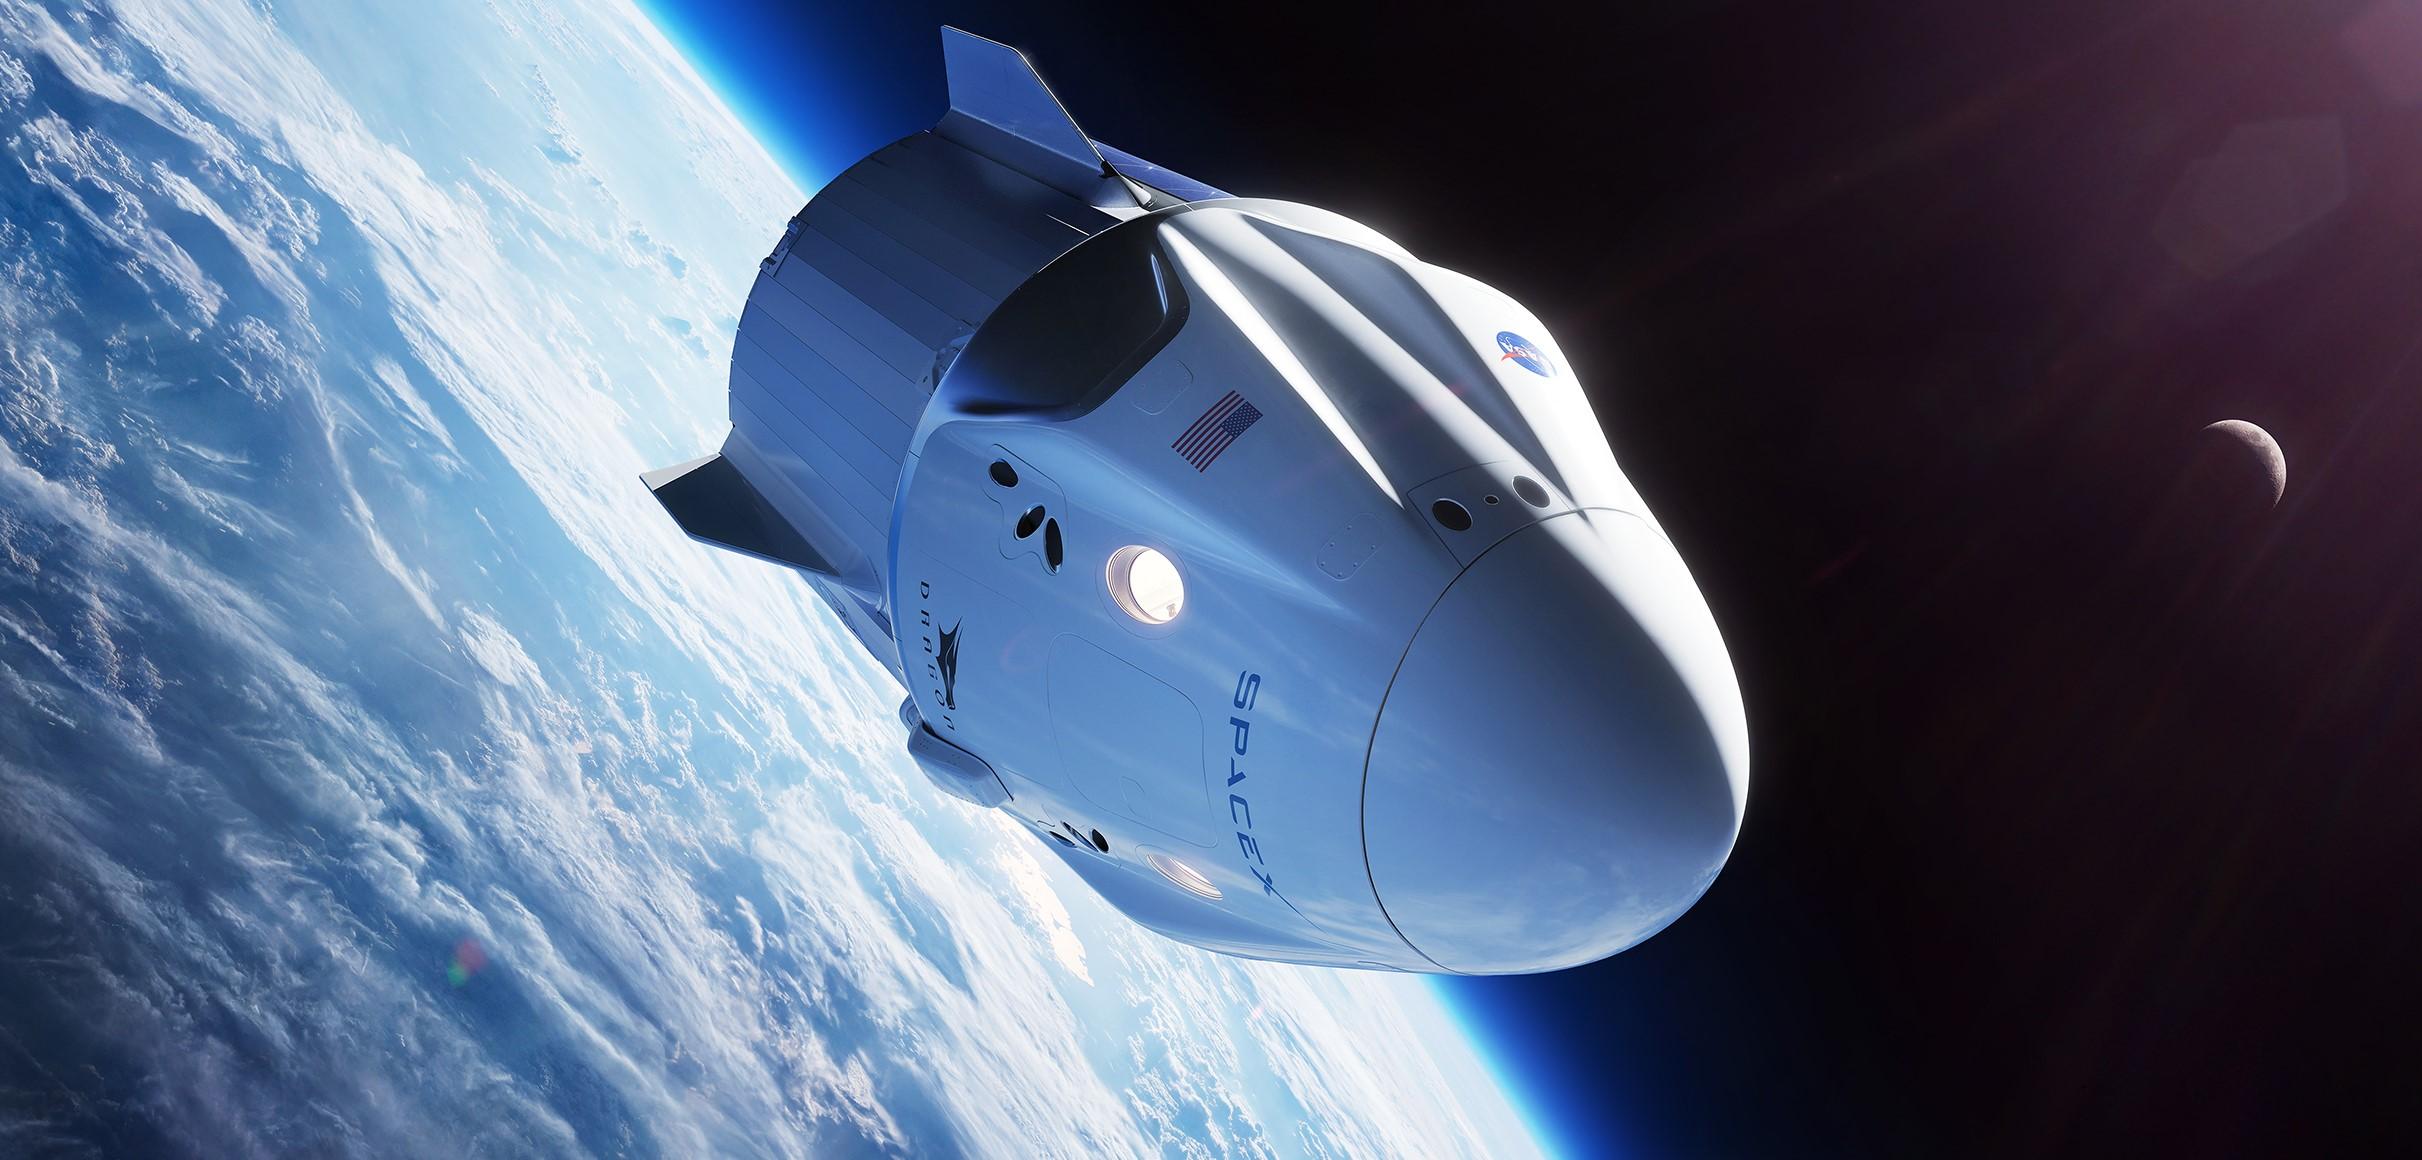 Blue Origin planning to send William Shatner to space